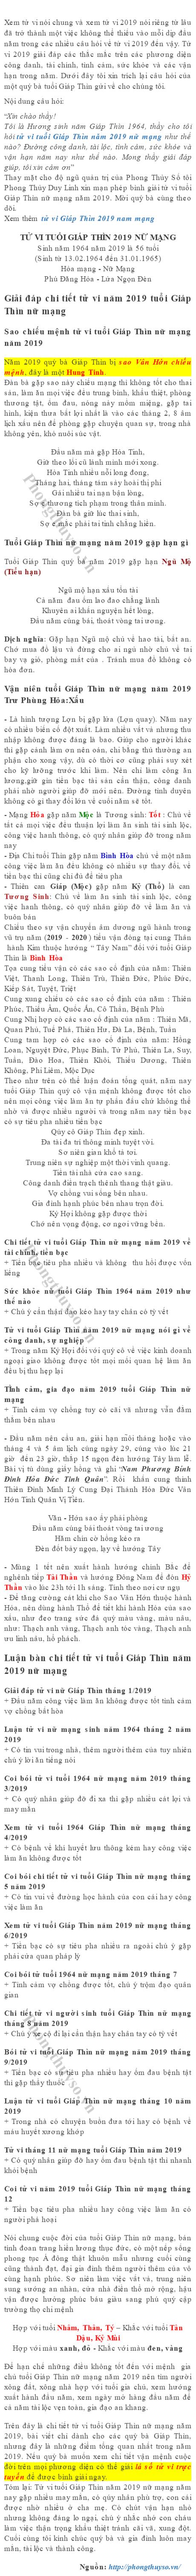 tu-vi-tuoi-giap-thin-nam-2019-nu-mang